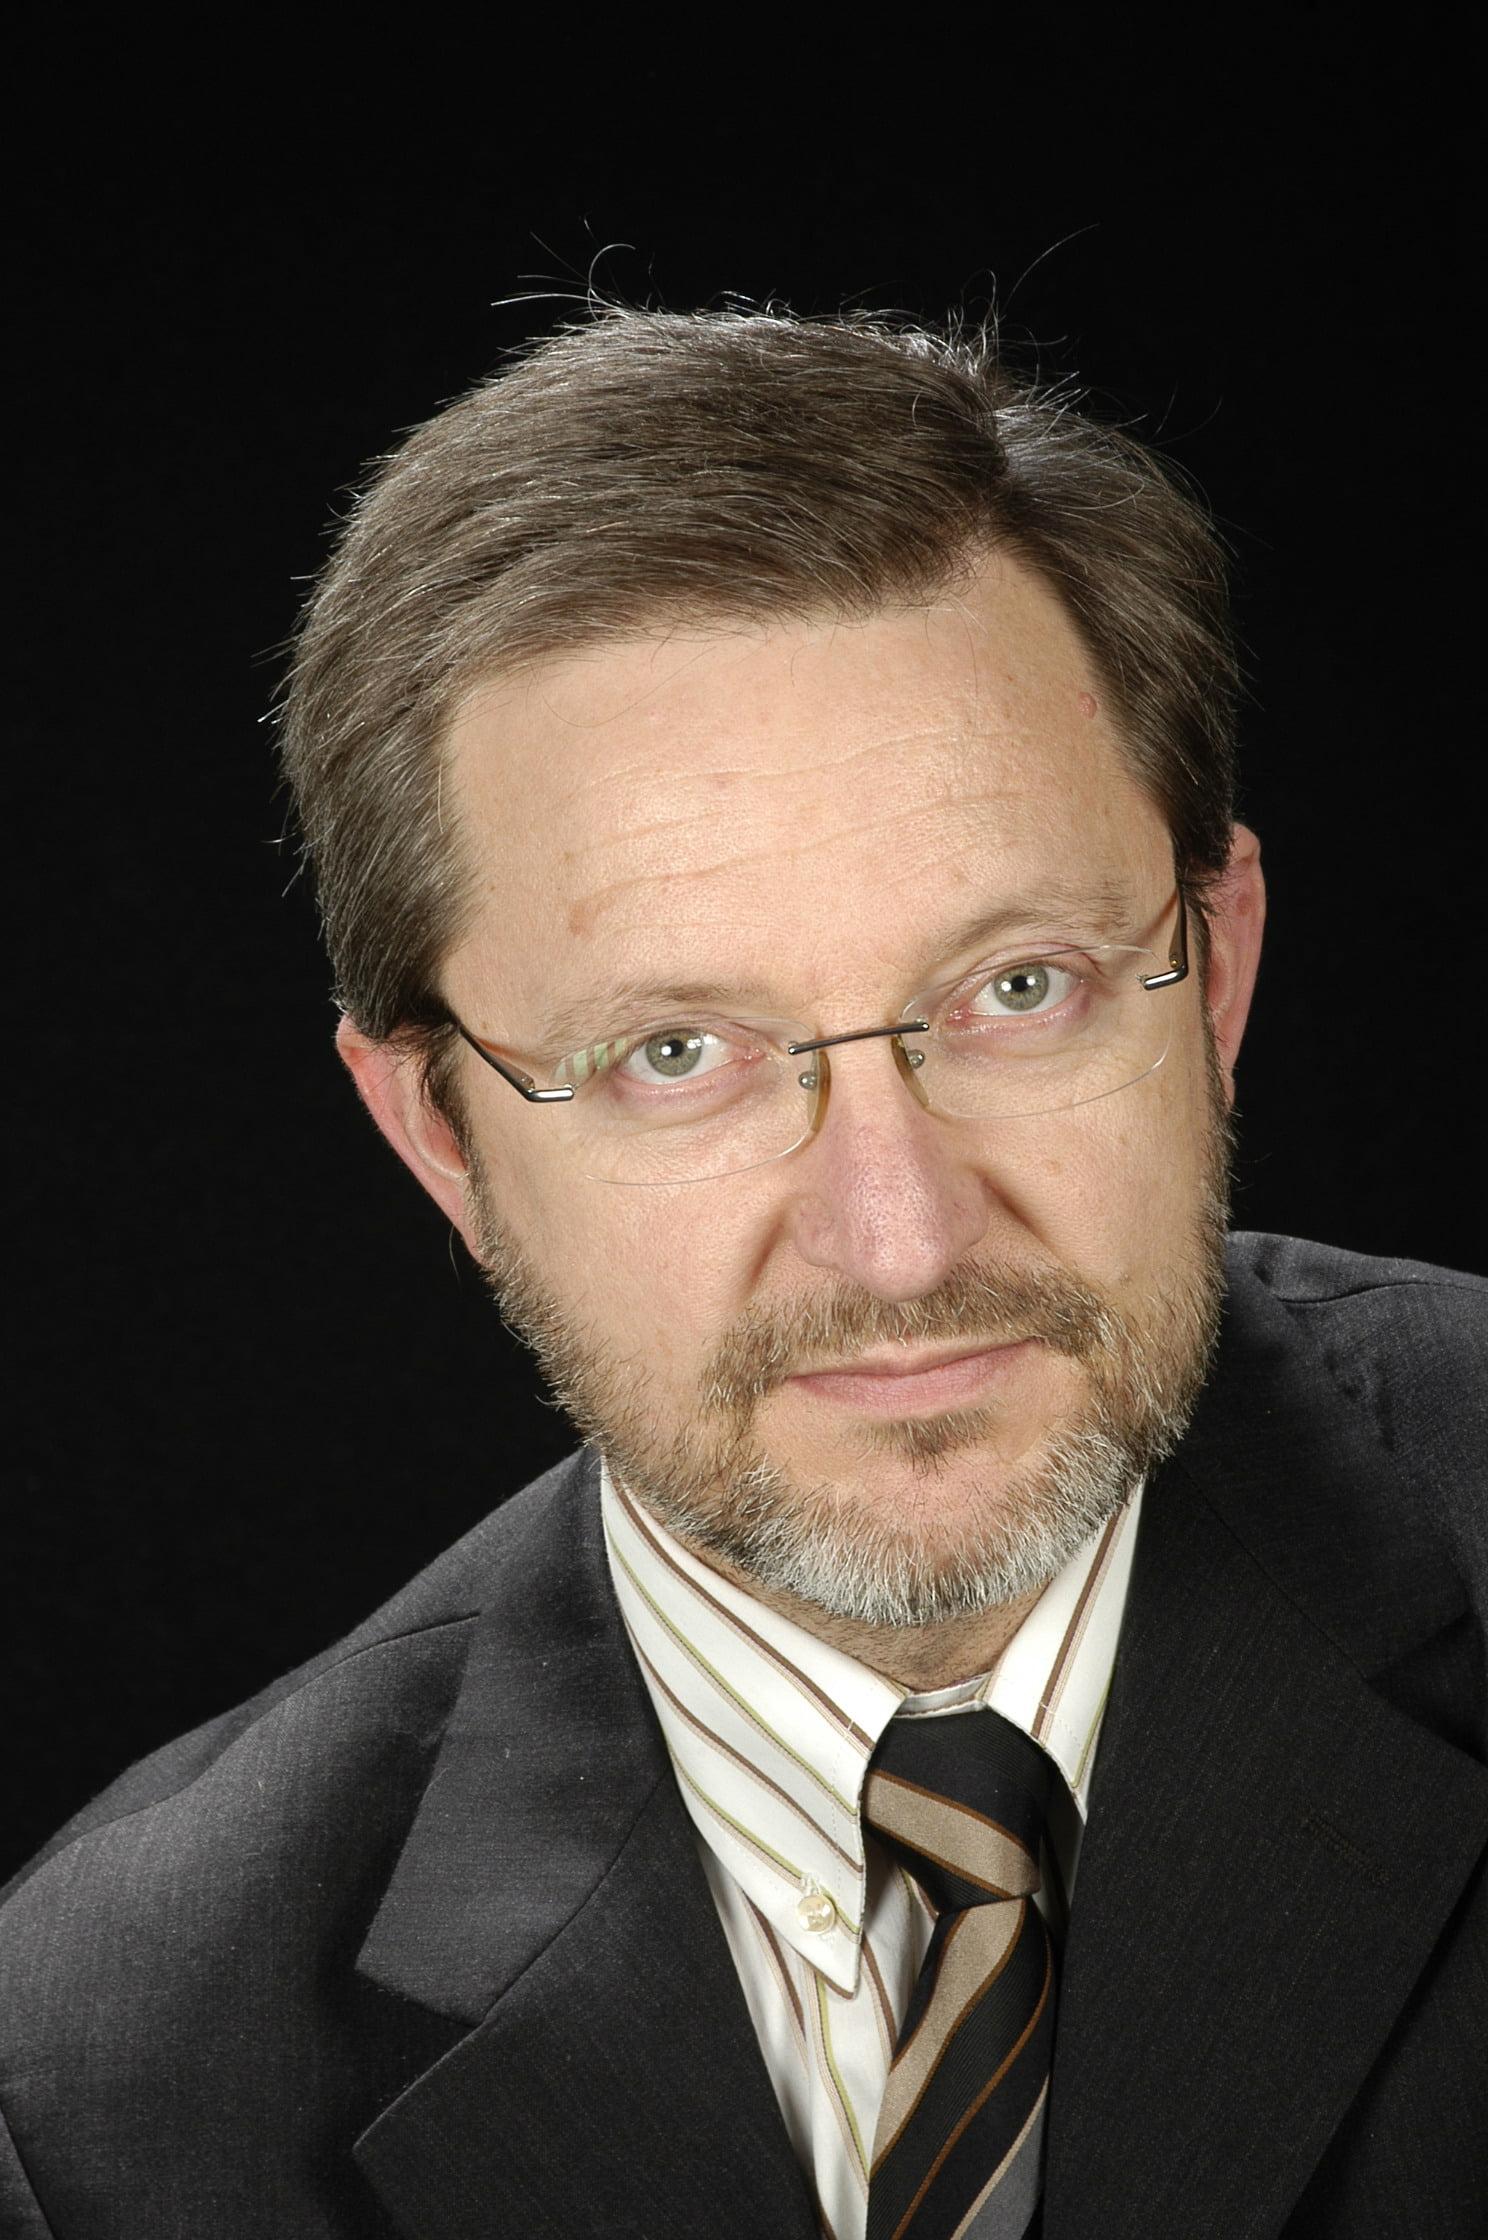 Dr. J. Bruno Montoro Ronsano